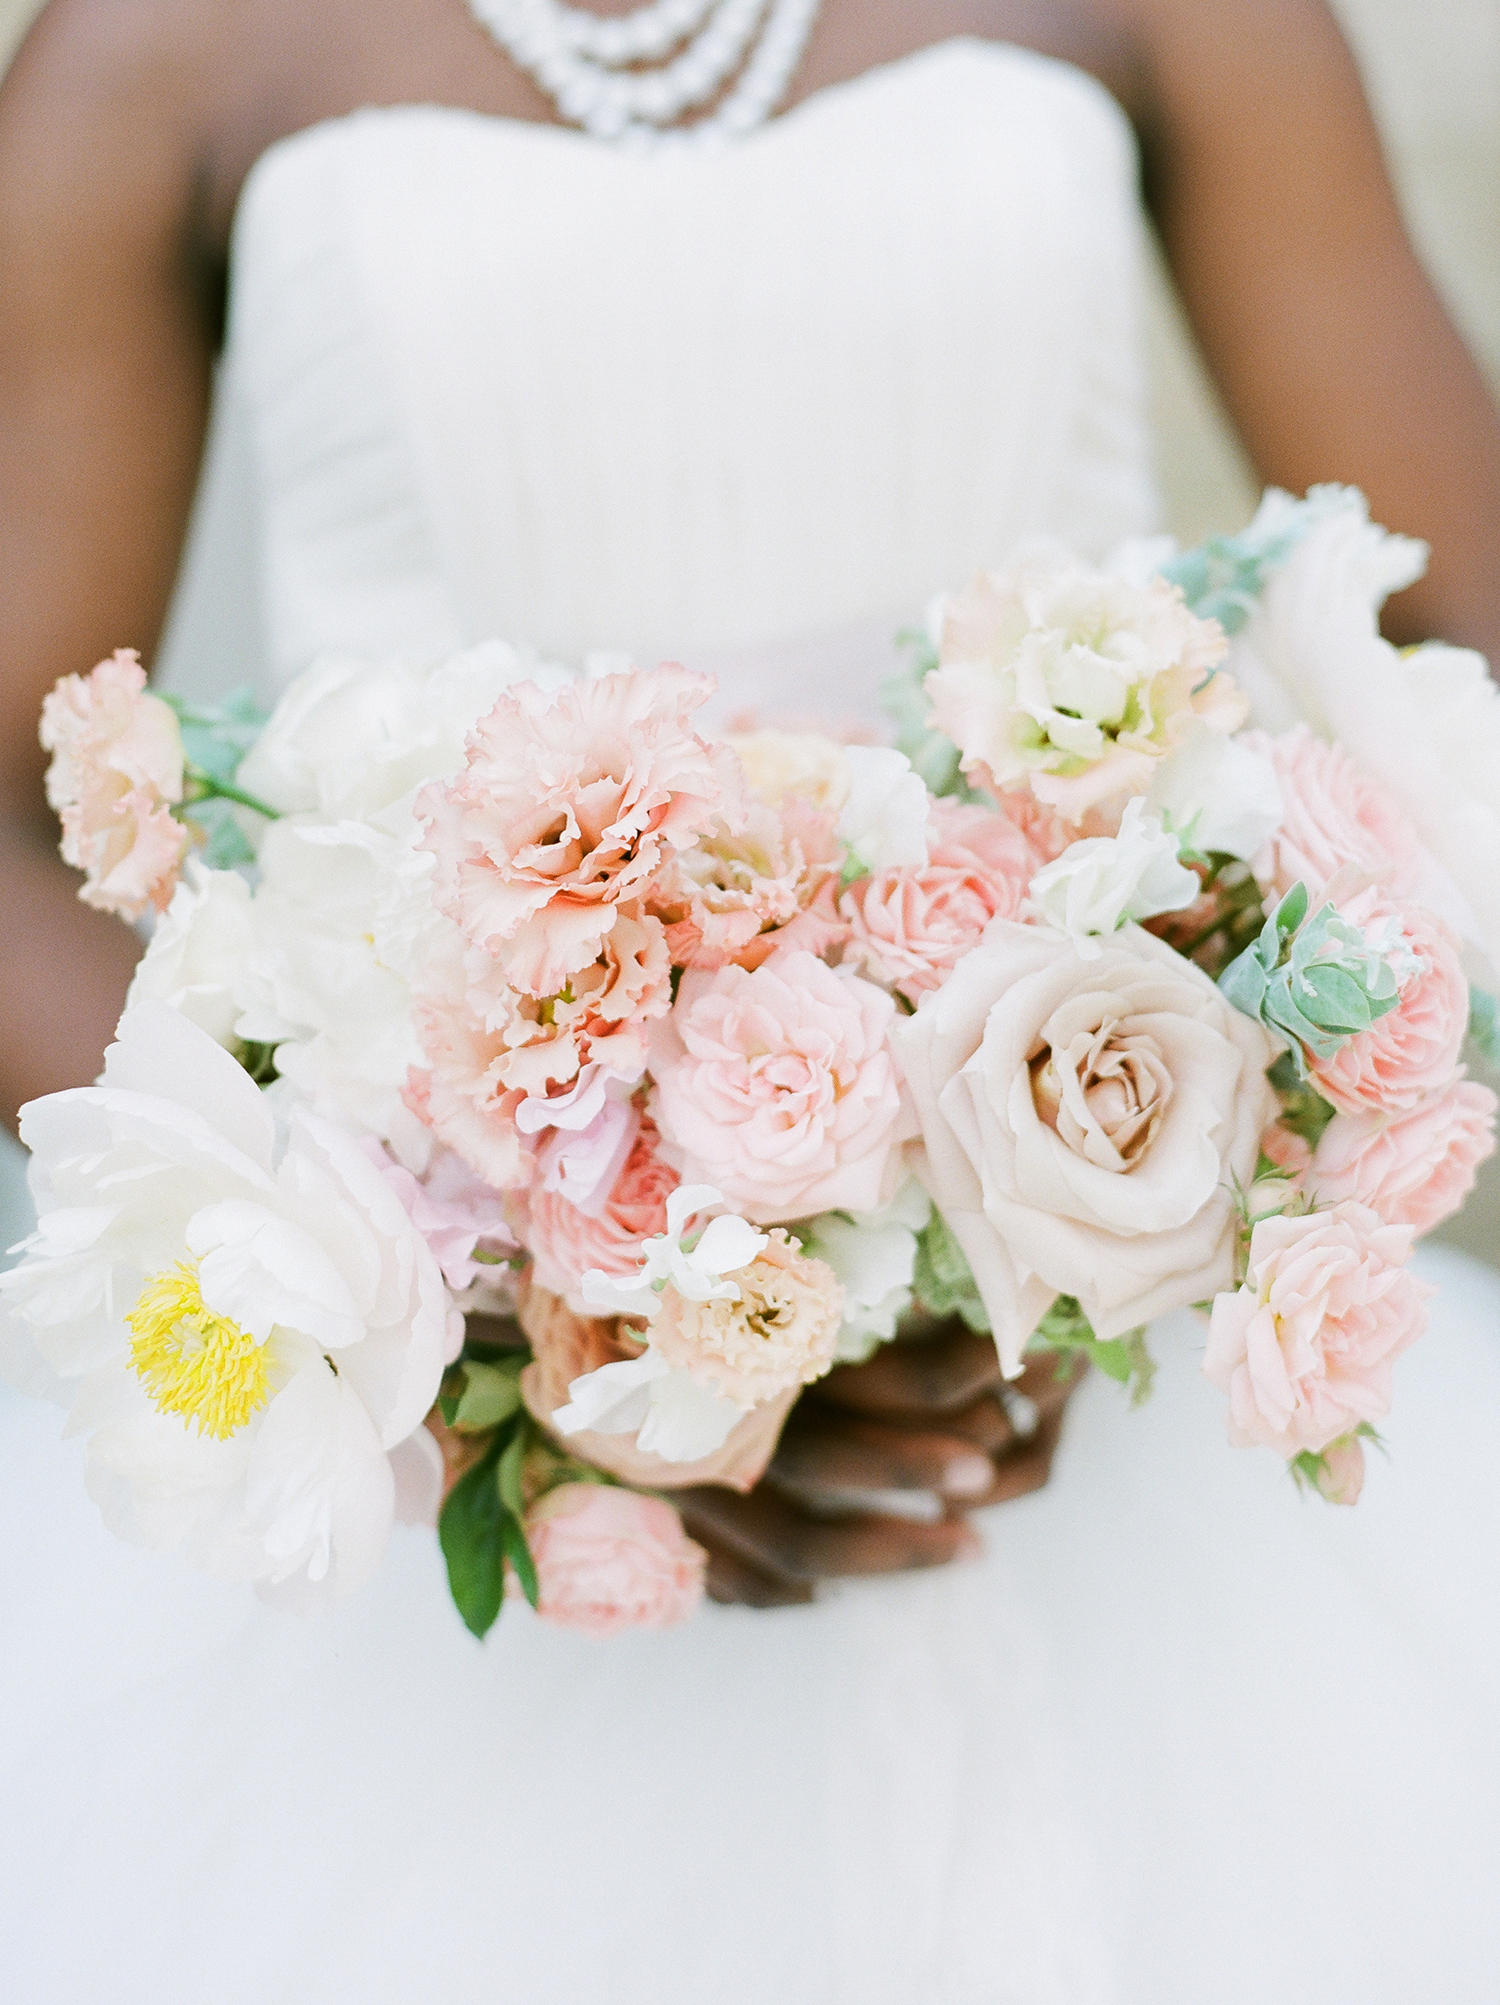 anwuli patrick wedding bouquet